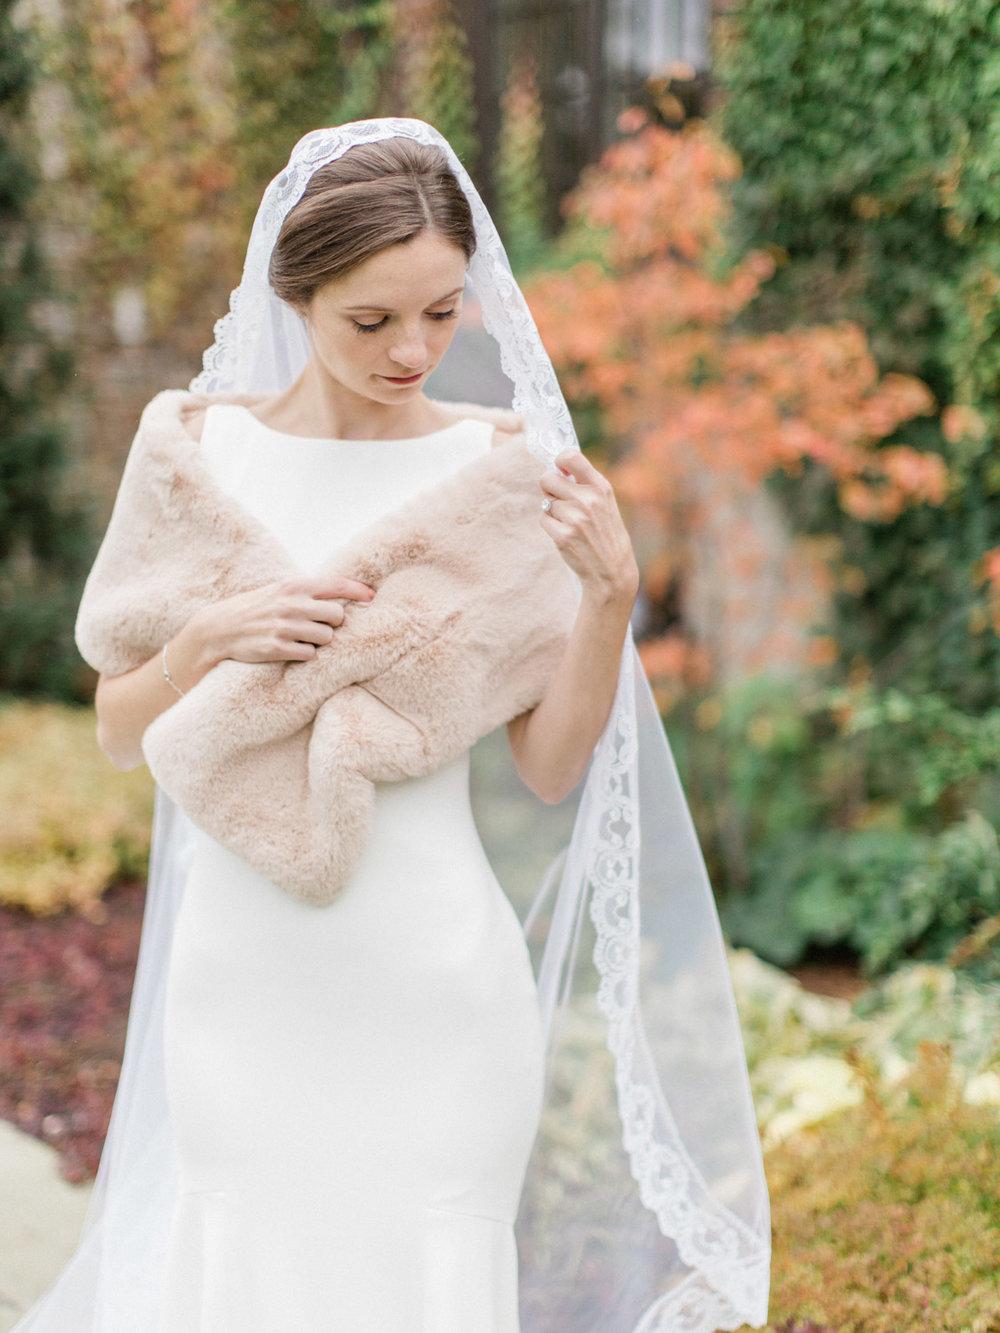 Toronto-wedding-photographer-st-georges-golf-club-jewish-modern-fall30.jpg